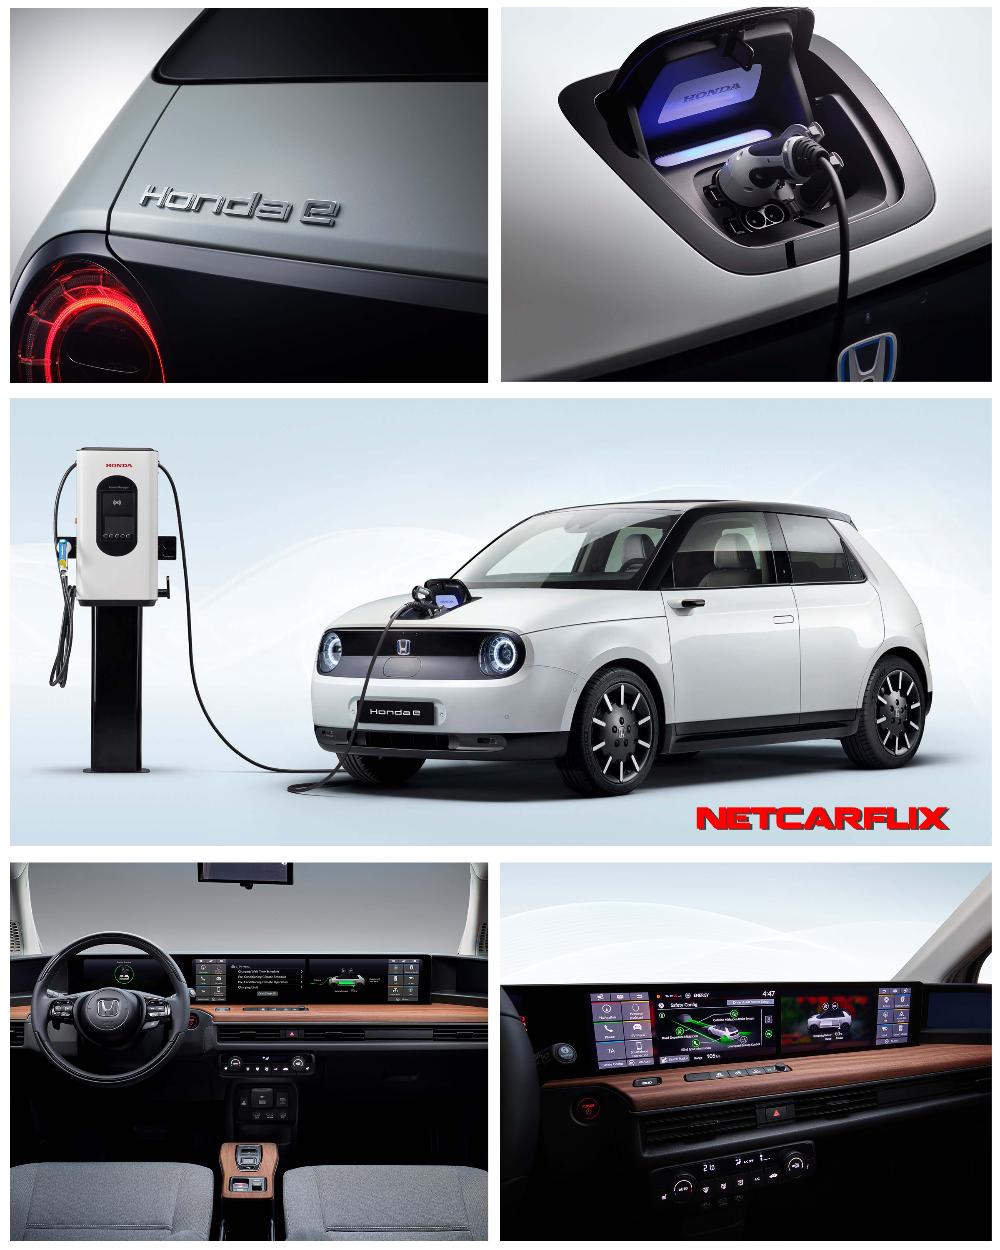 2021 Honda E Dailyrevs Honda, Digital dashboard, Car